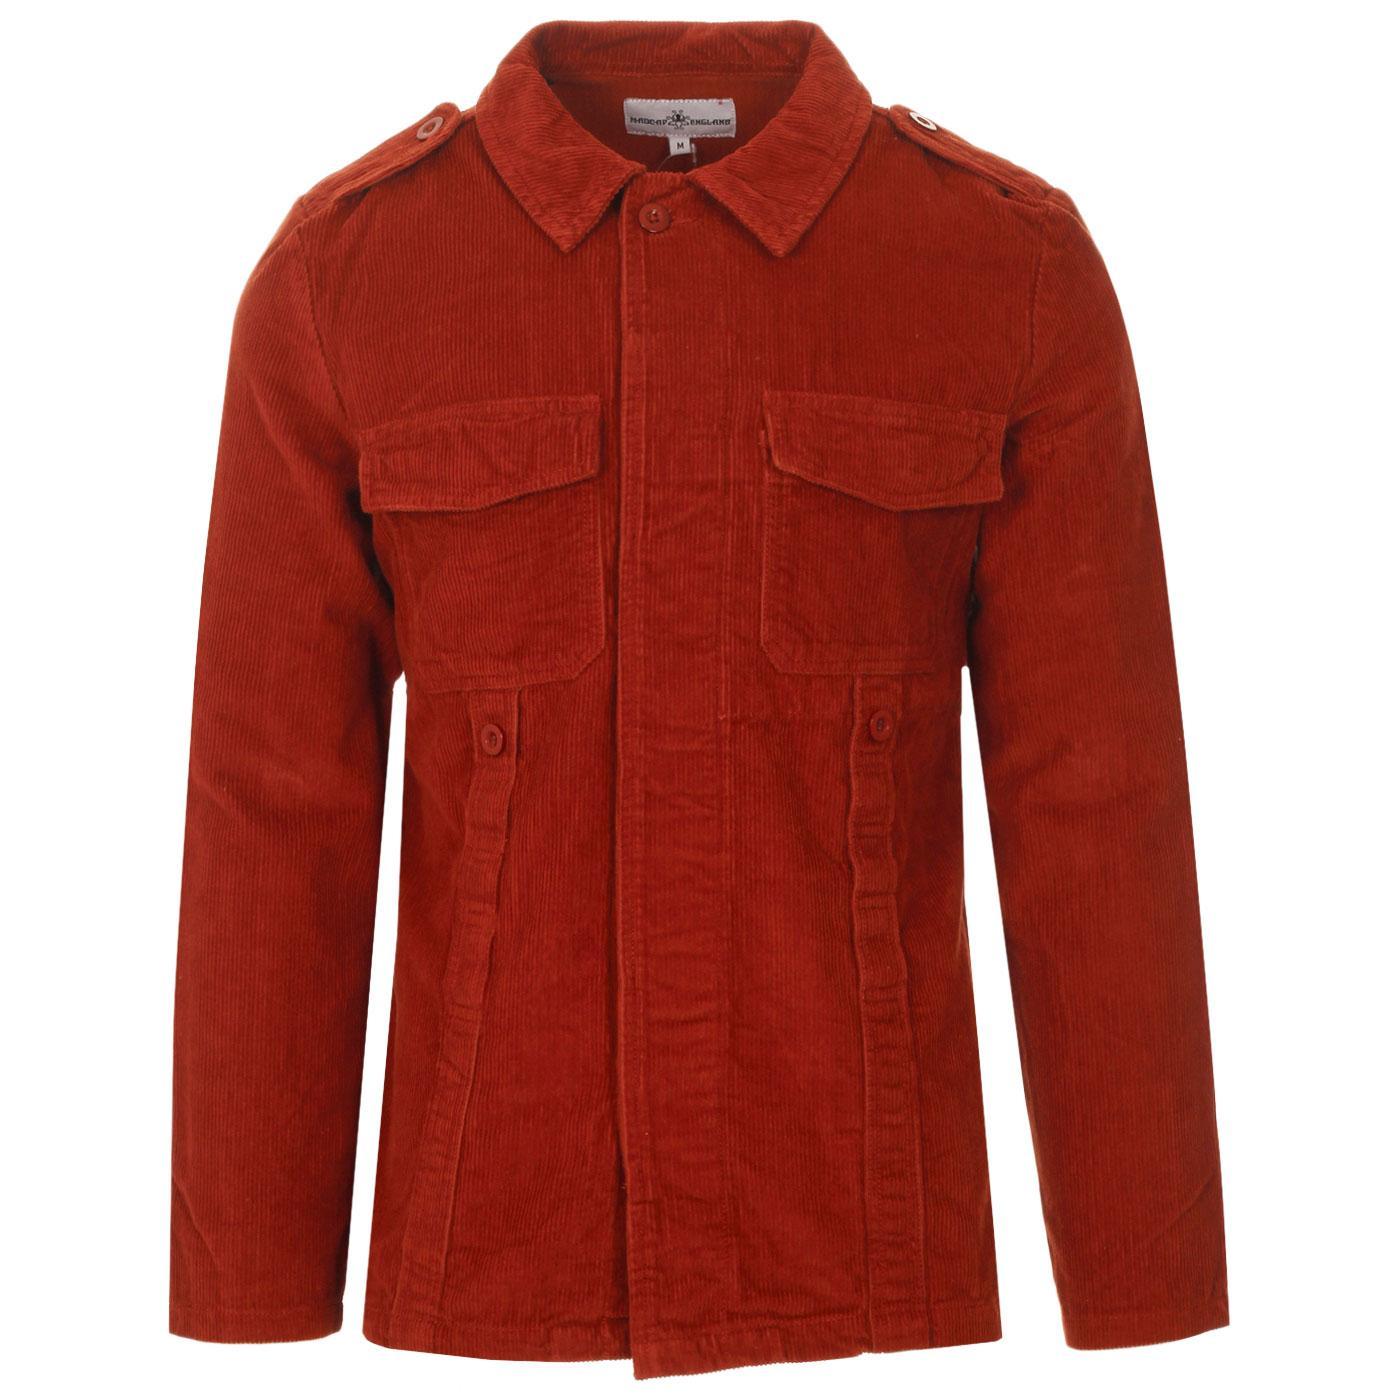 Lennon MADCAP ENGLAND Mod Cord Shirt Jacket (Rust)